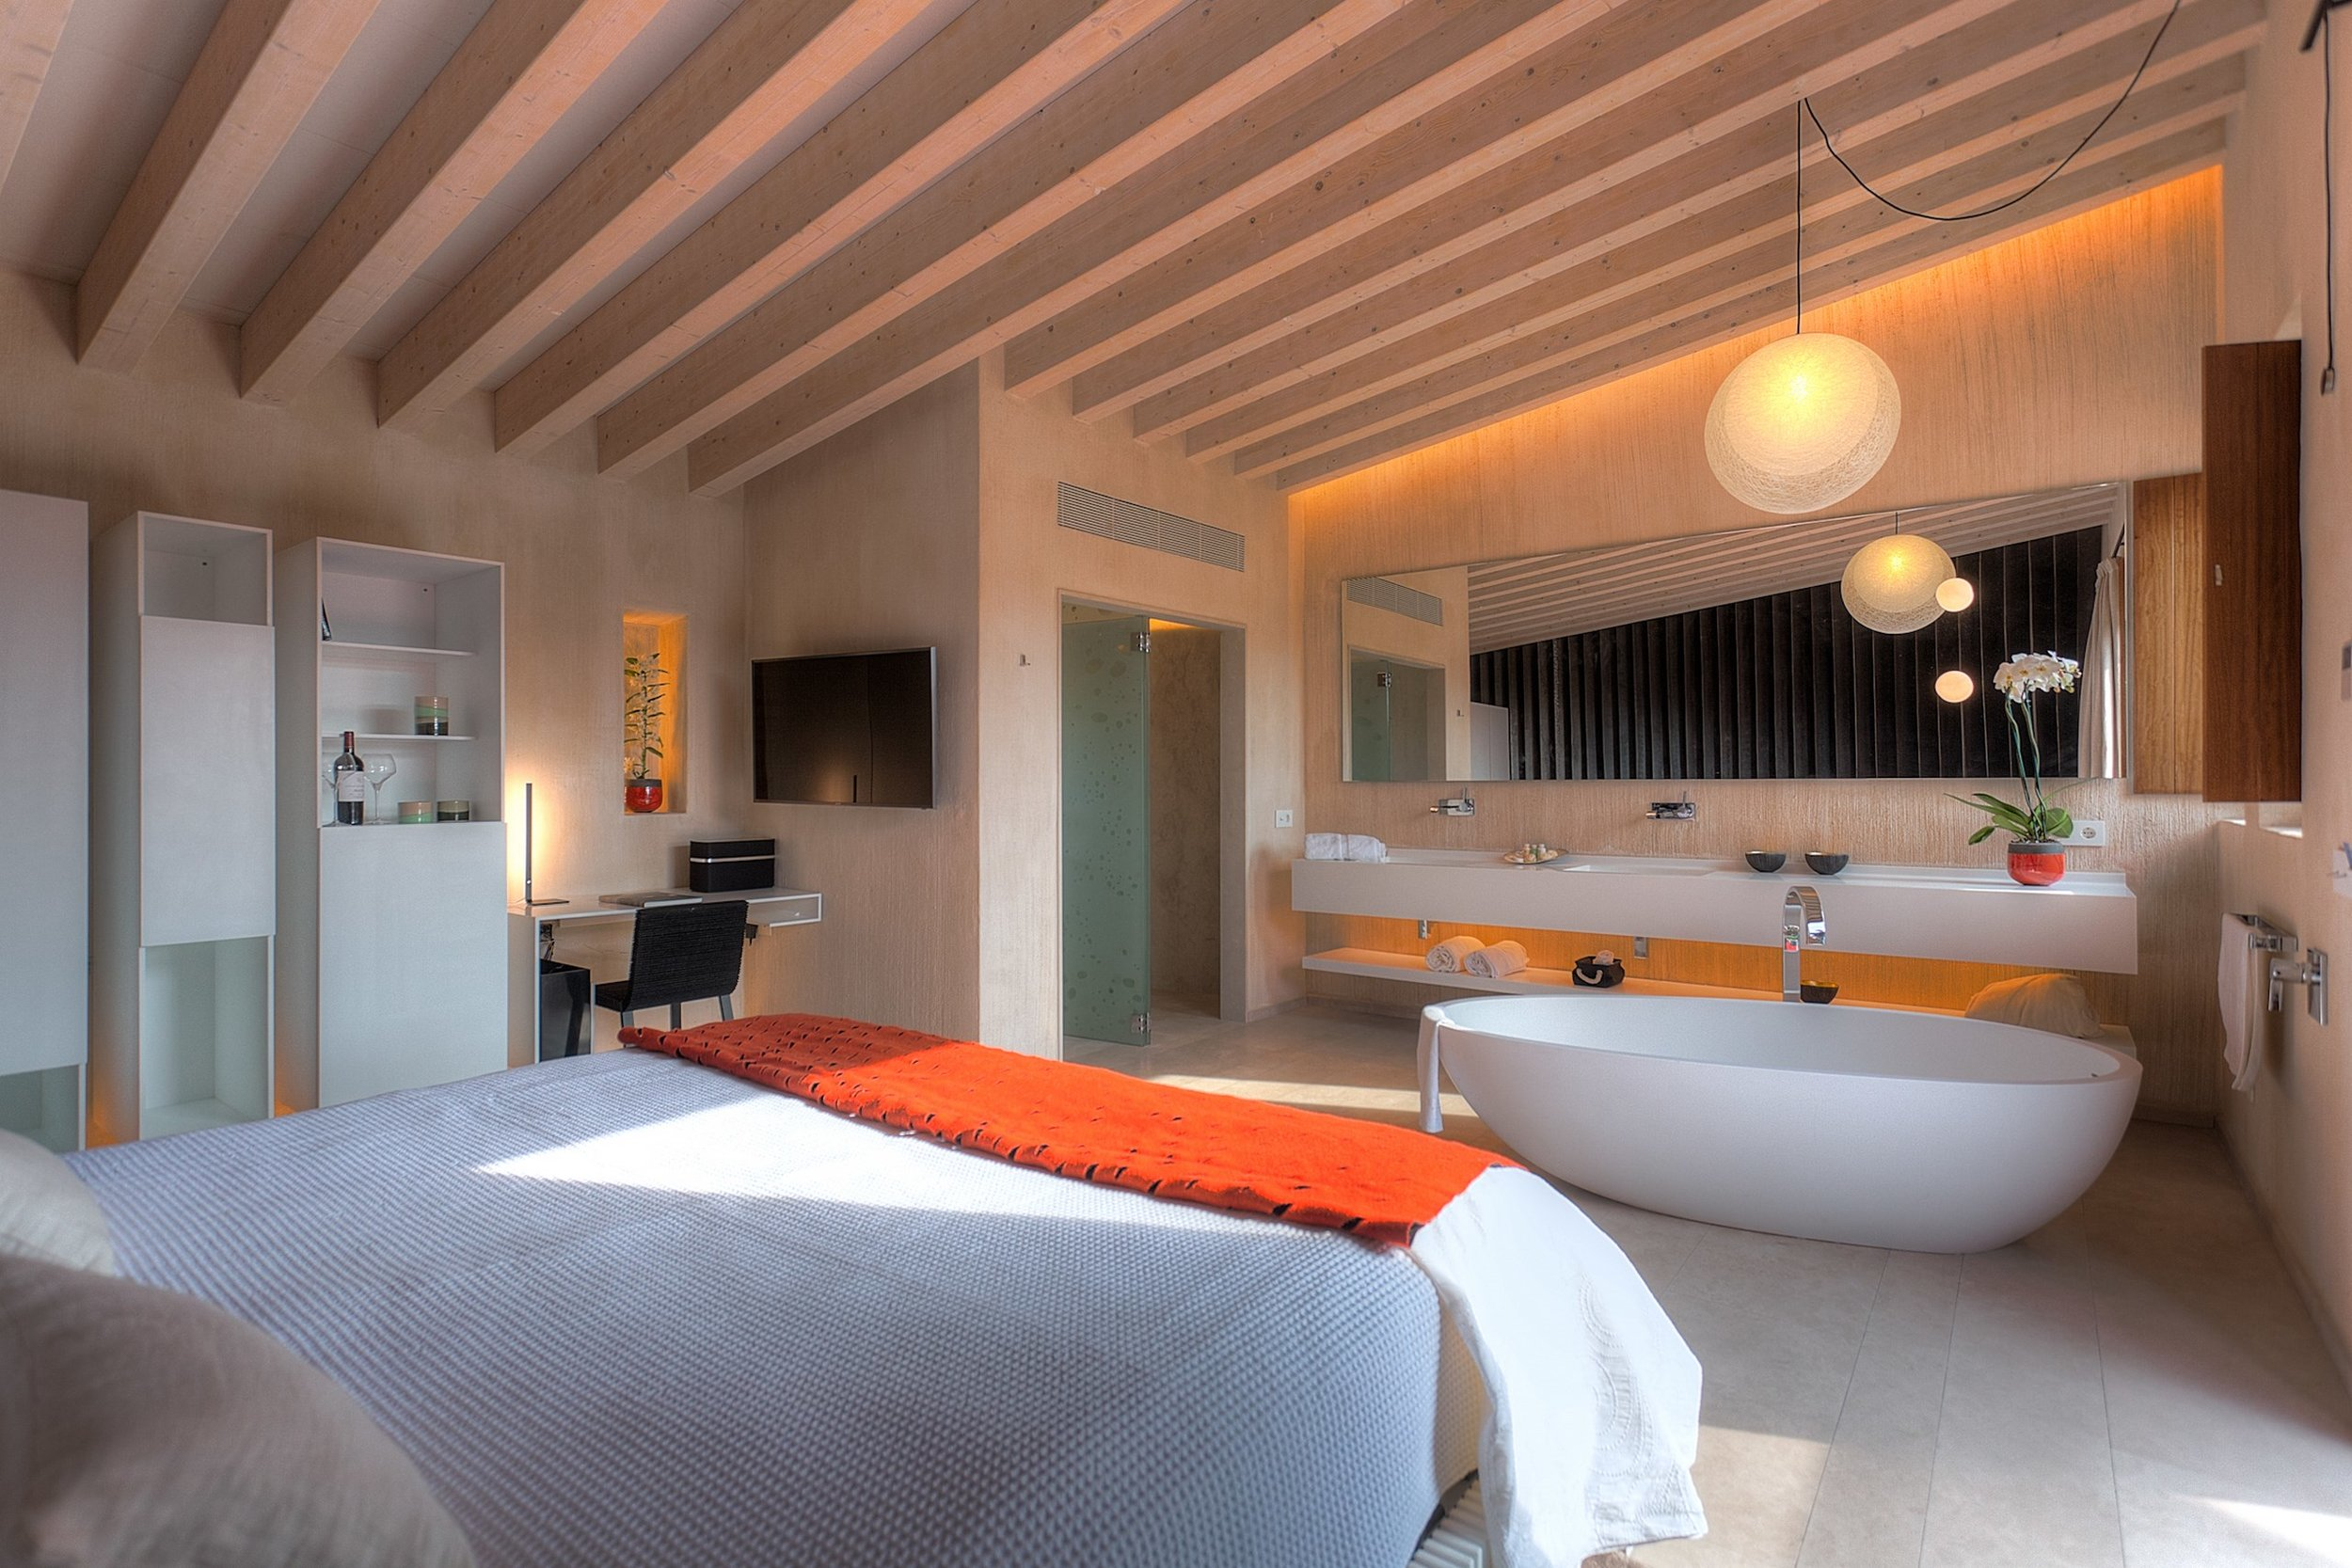 hotel_carreo_tonemapped.17_copiar.jpg